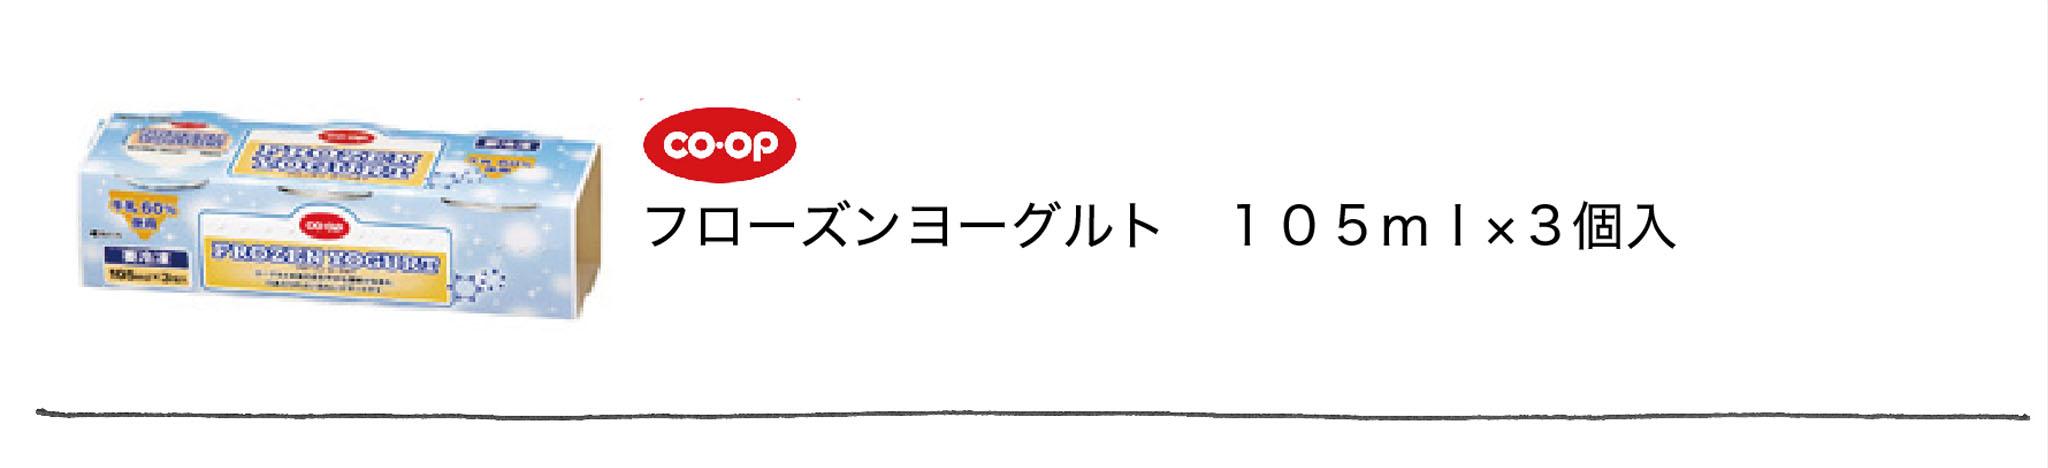 natuoyasu_c.jpg